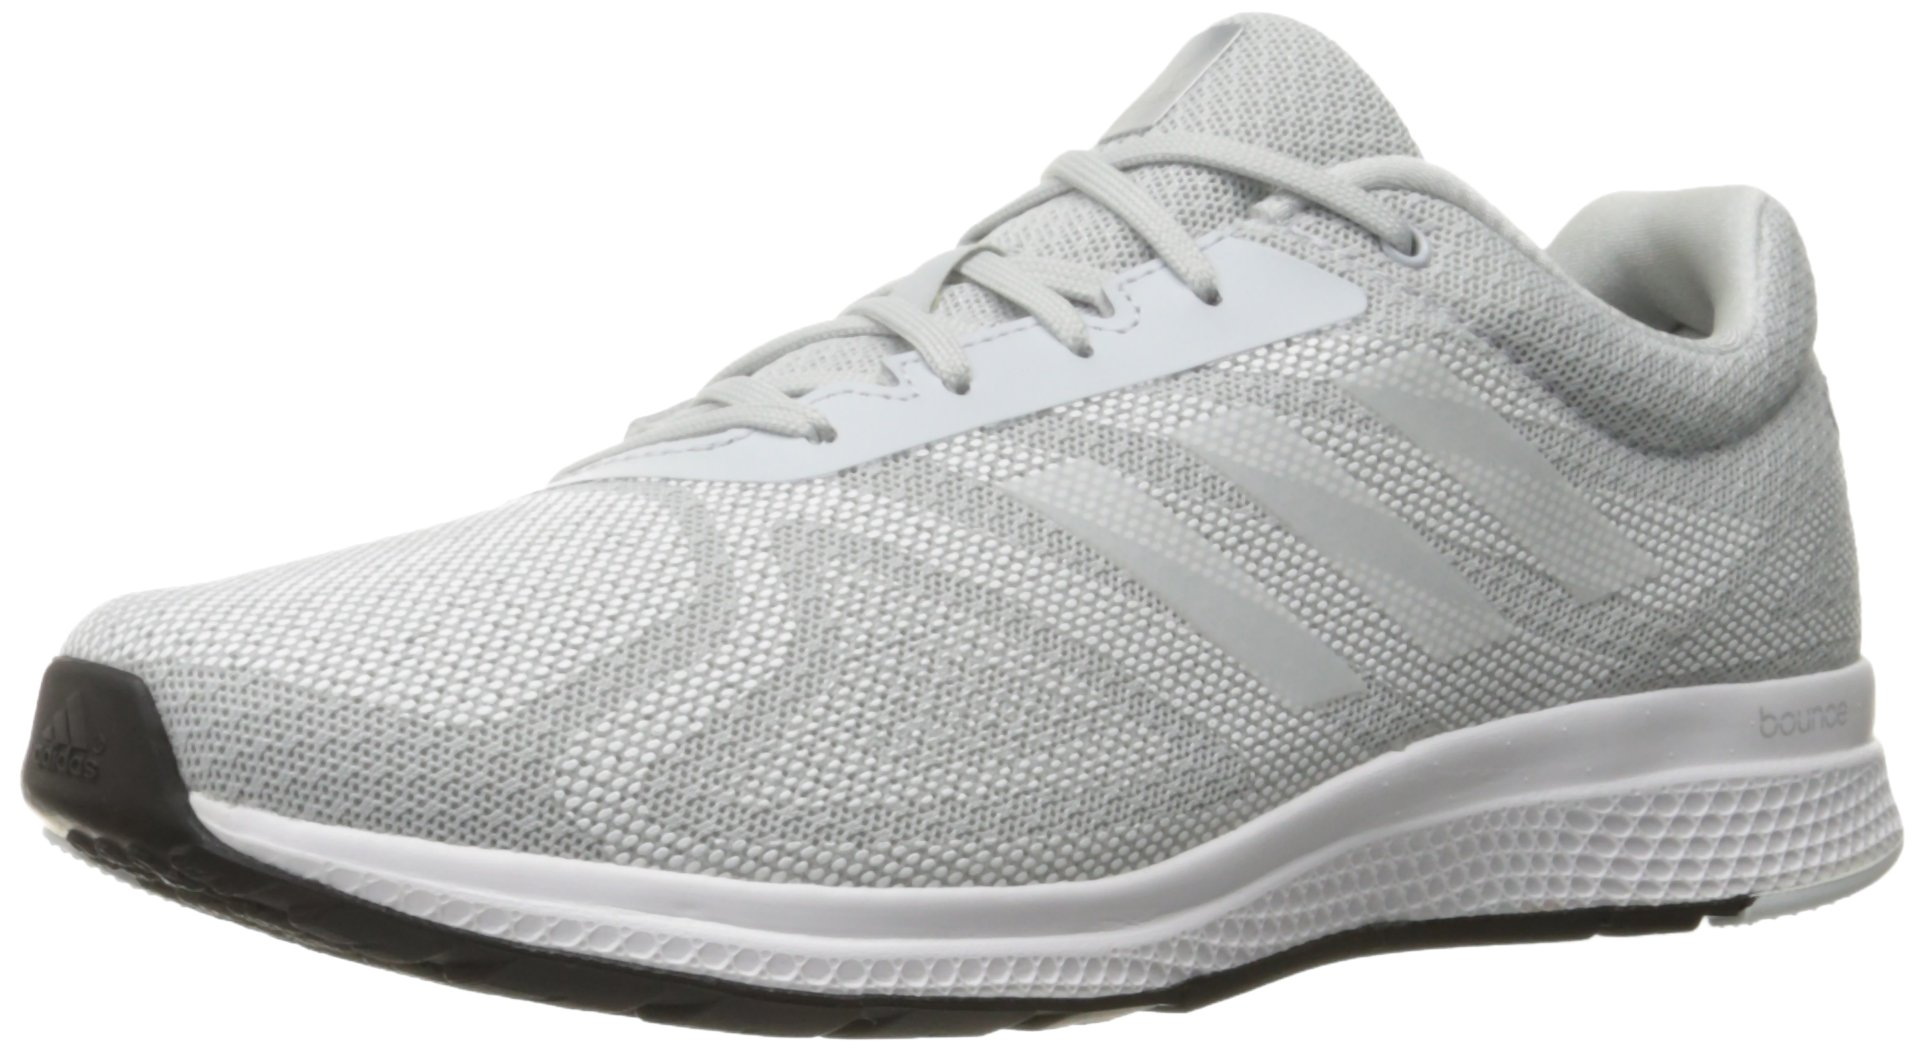 402c082d0 Galleon - Adidas Women s MANA Bounce W Running Shoe Clear Grey S12 White Black  9.5 M US